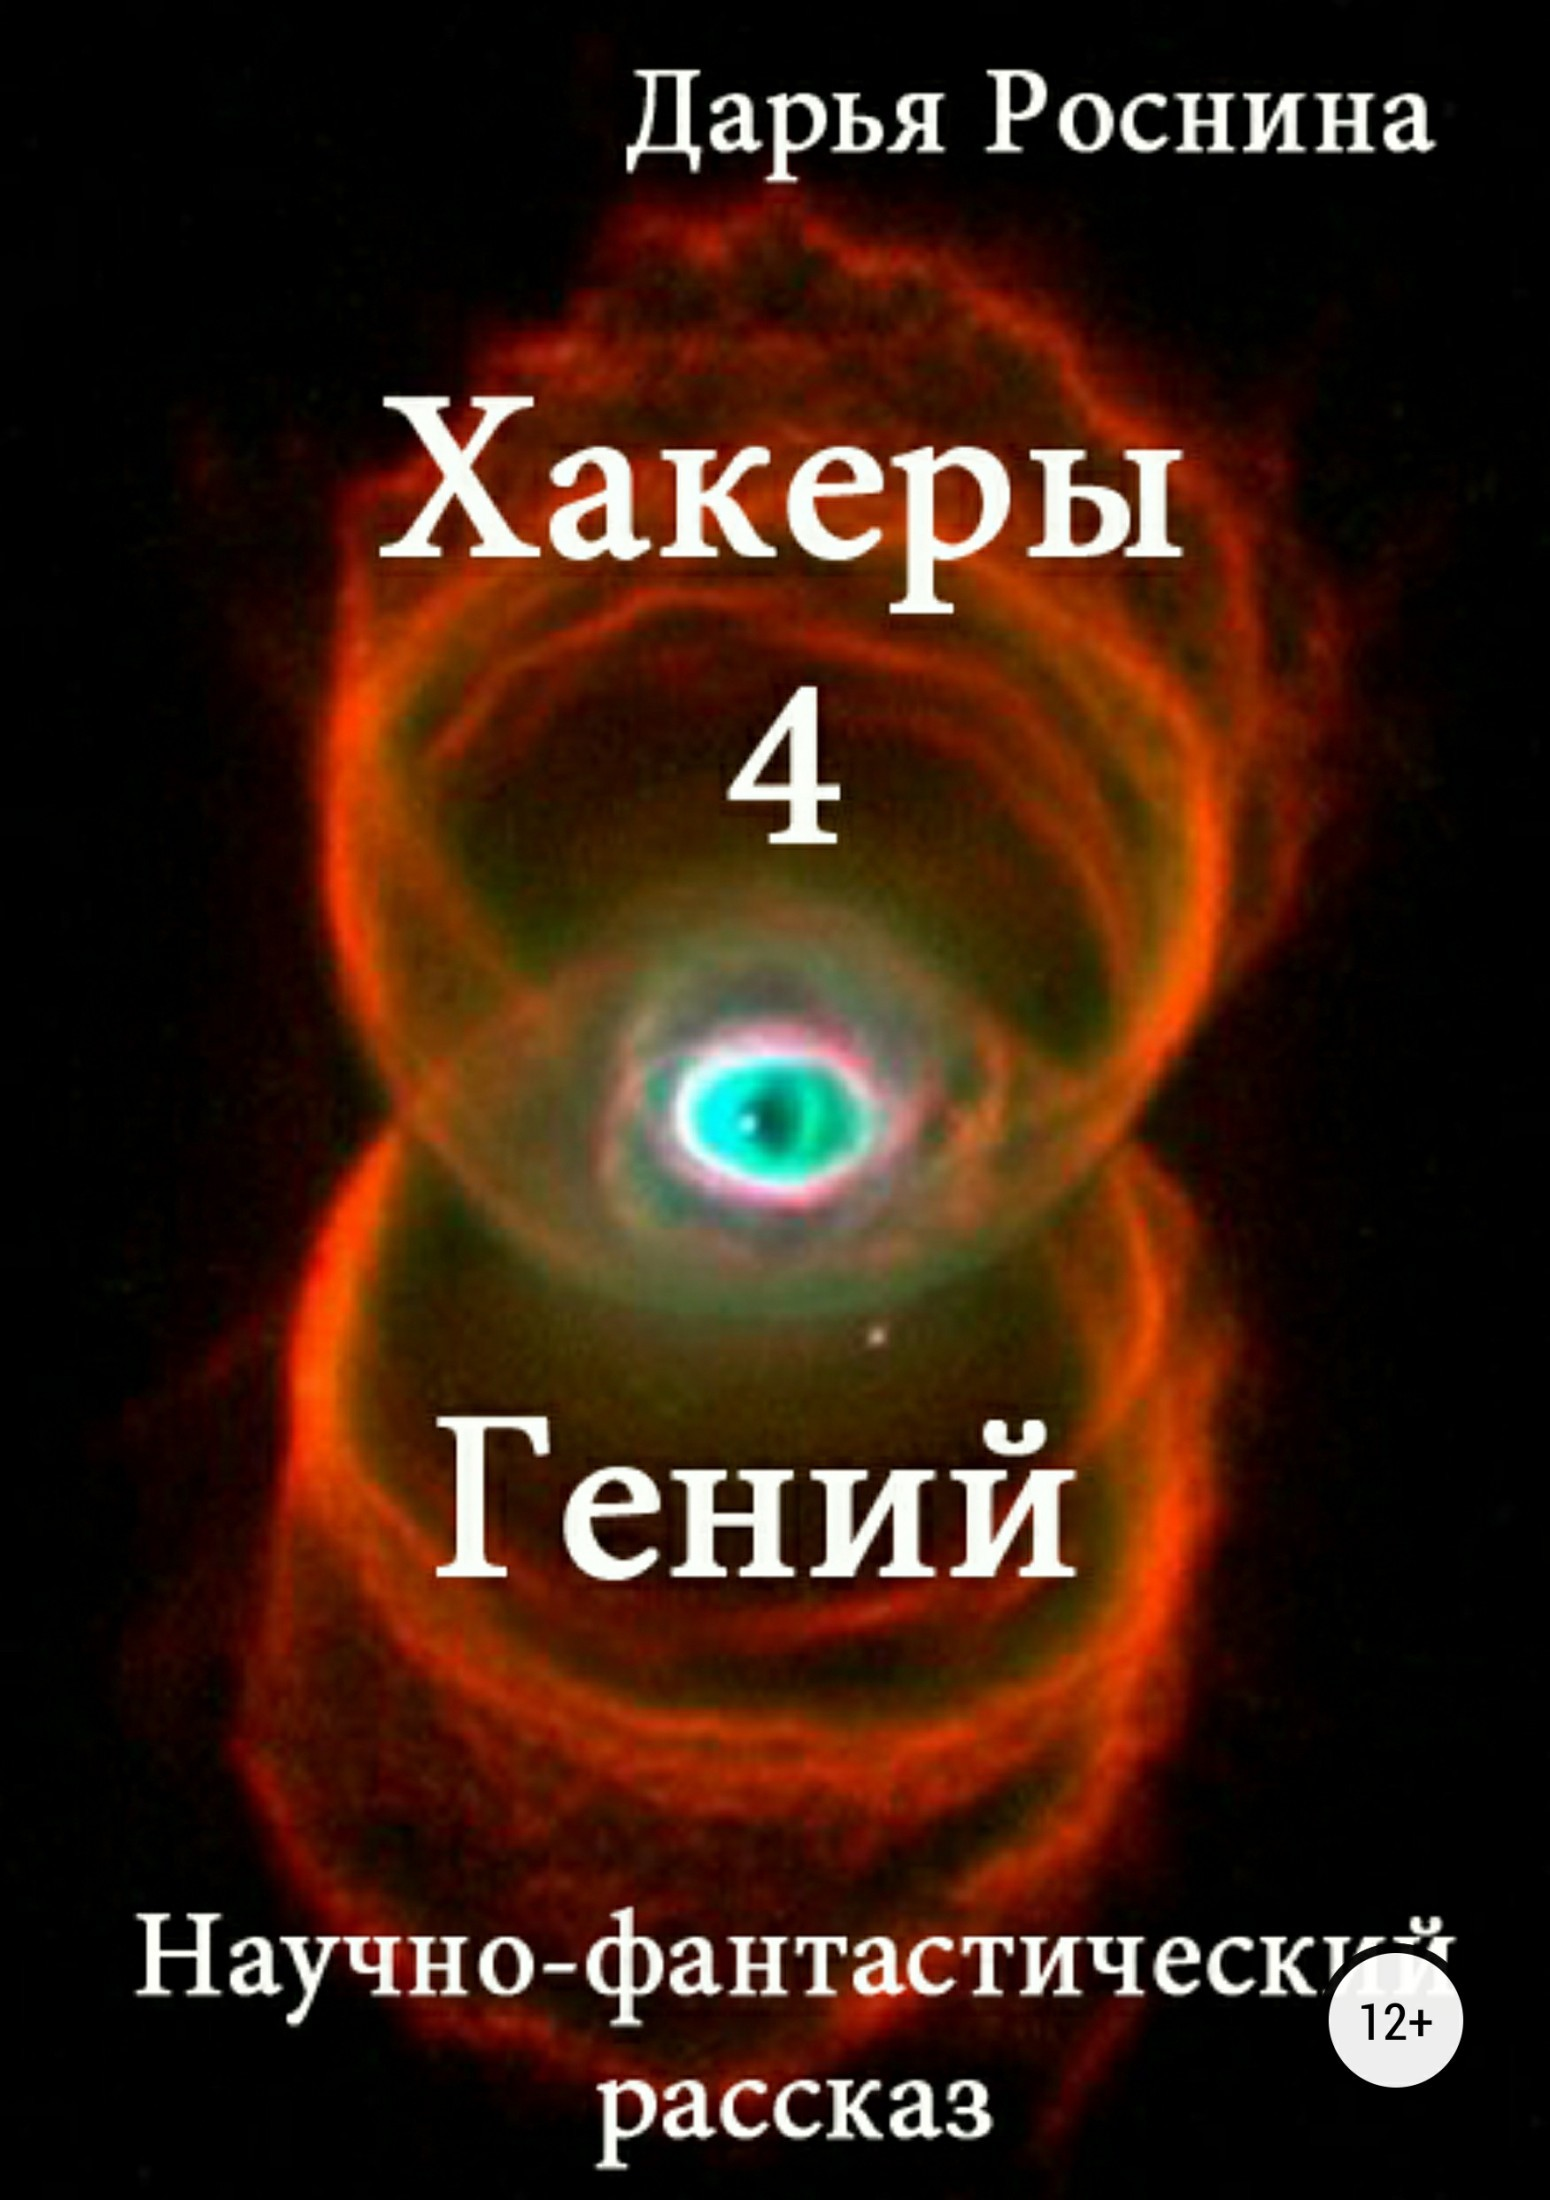 Дарья Дмитриевна Роснина. Хакеры 4. Гений